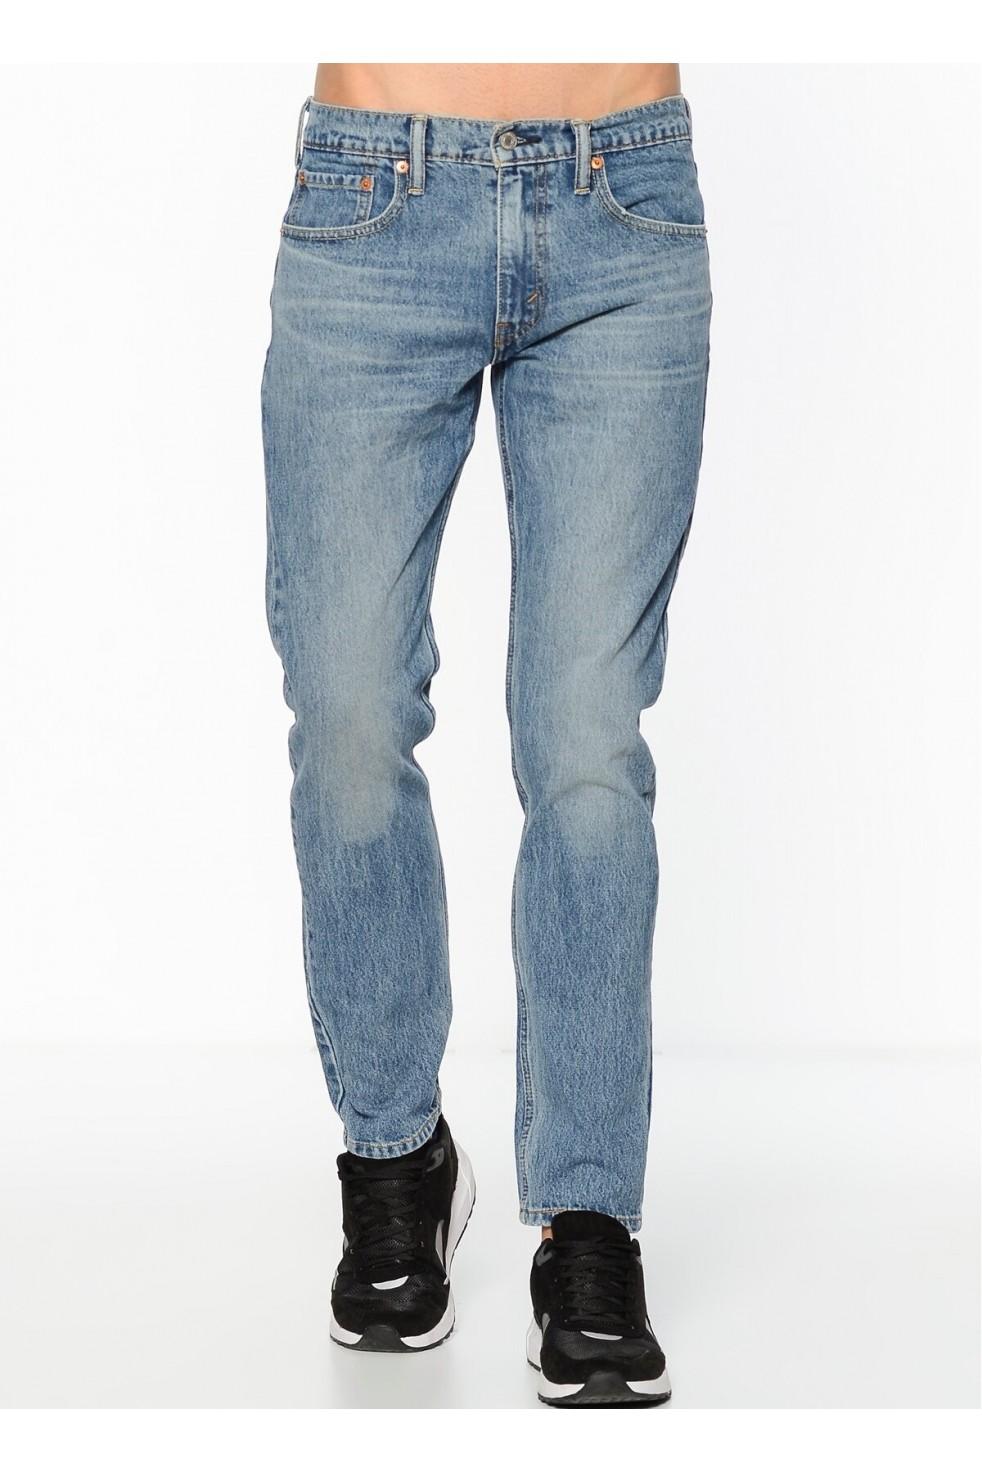 Levis-Erkek-Jean-Pantolon-512-Slim-Taper-Fit-28833-0158